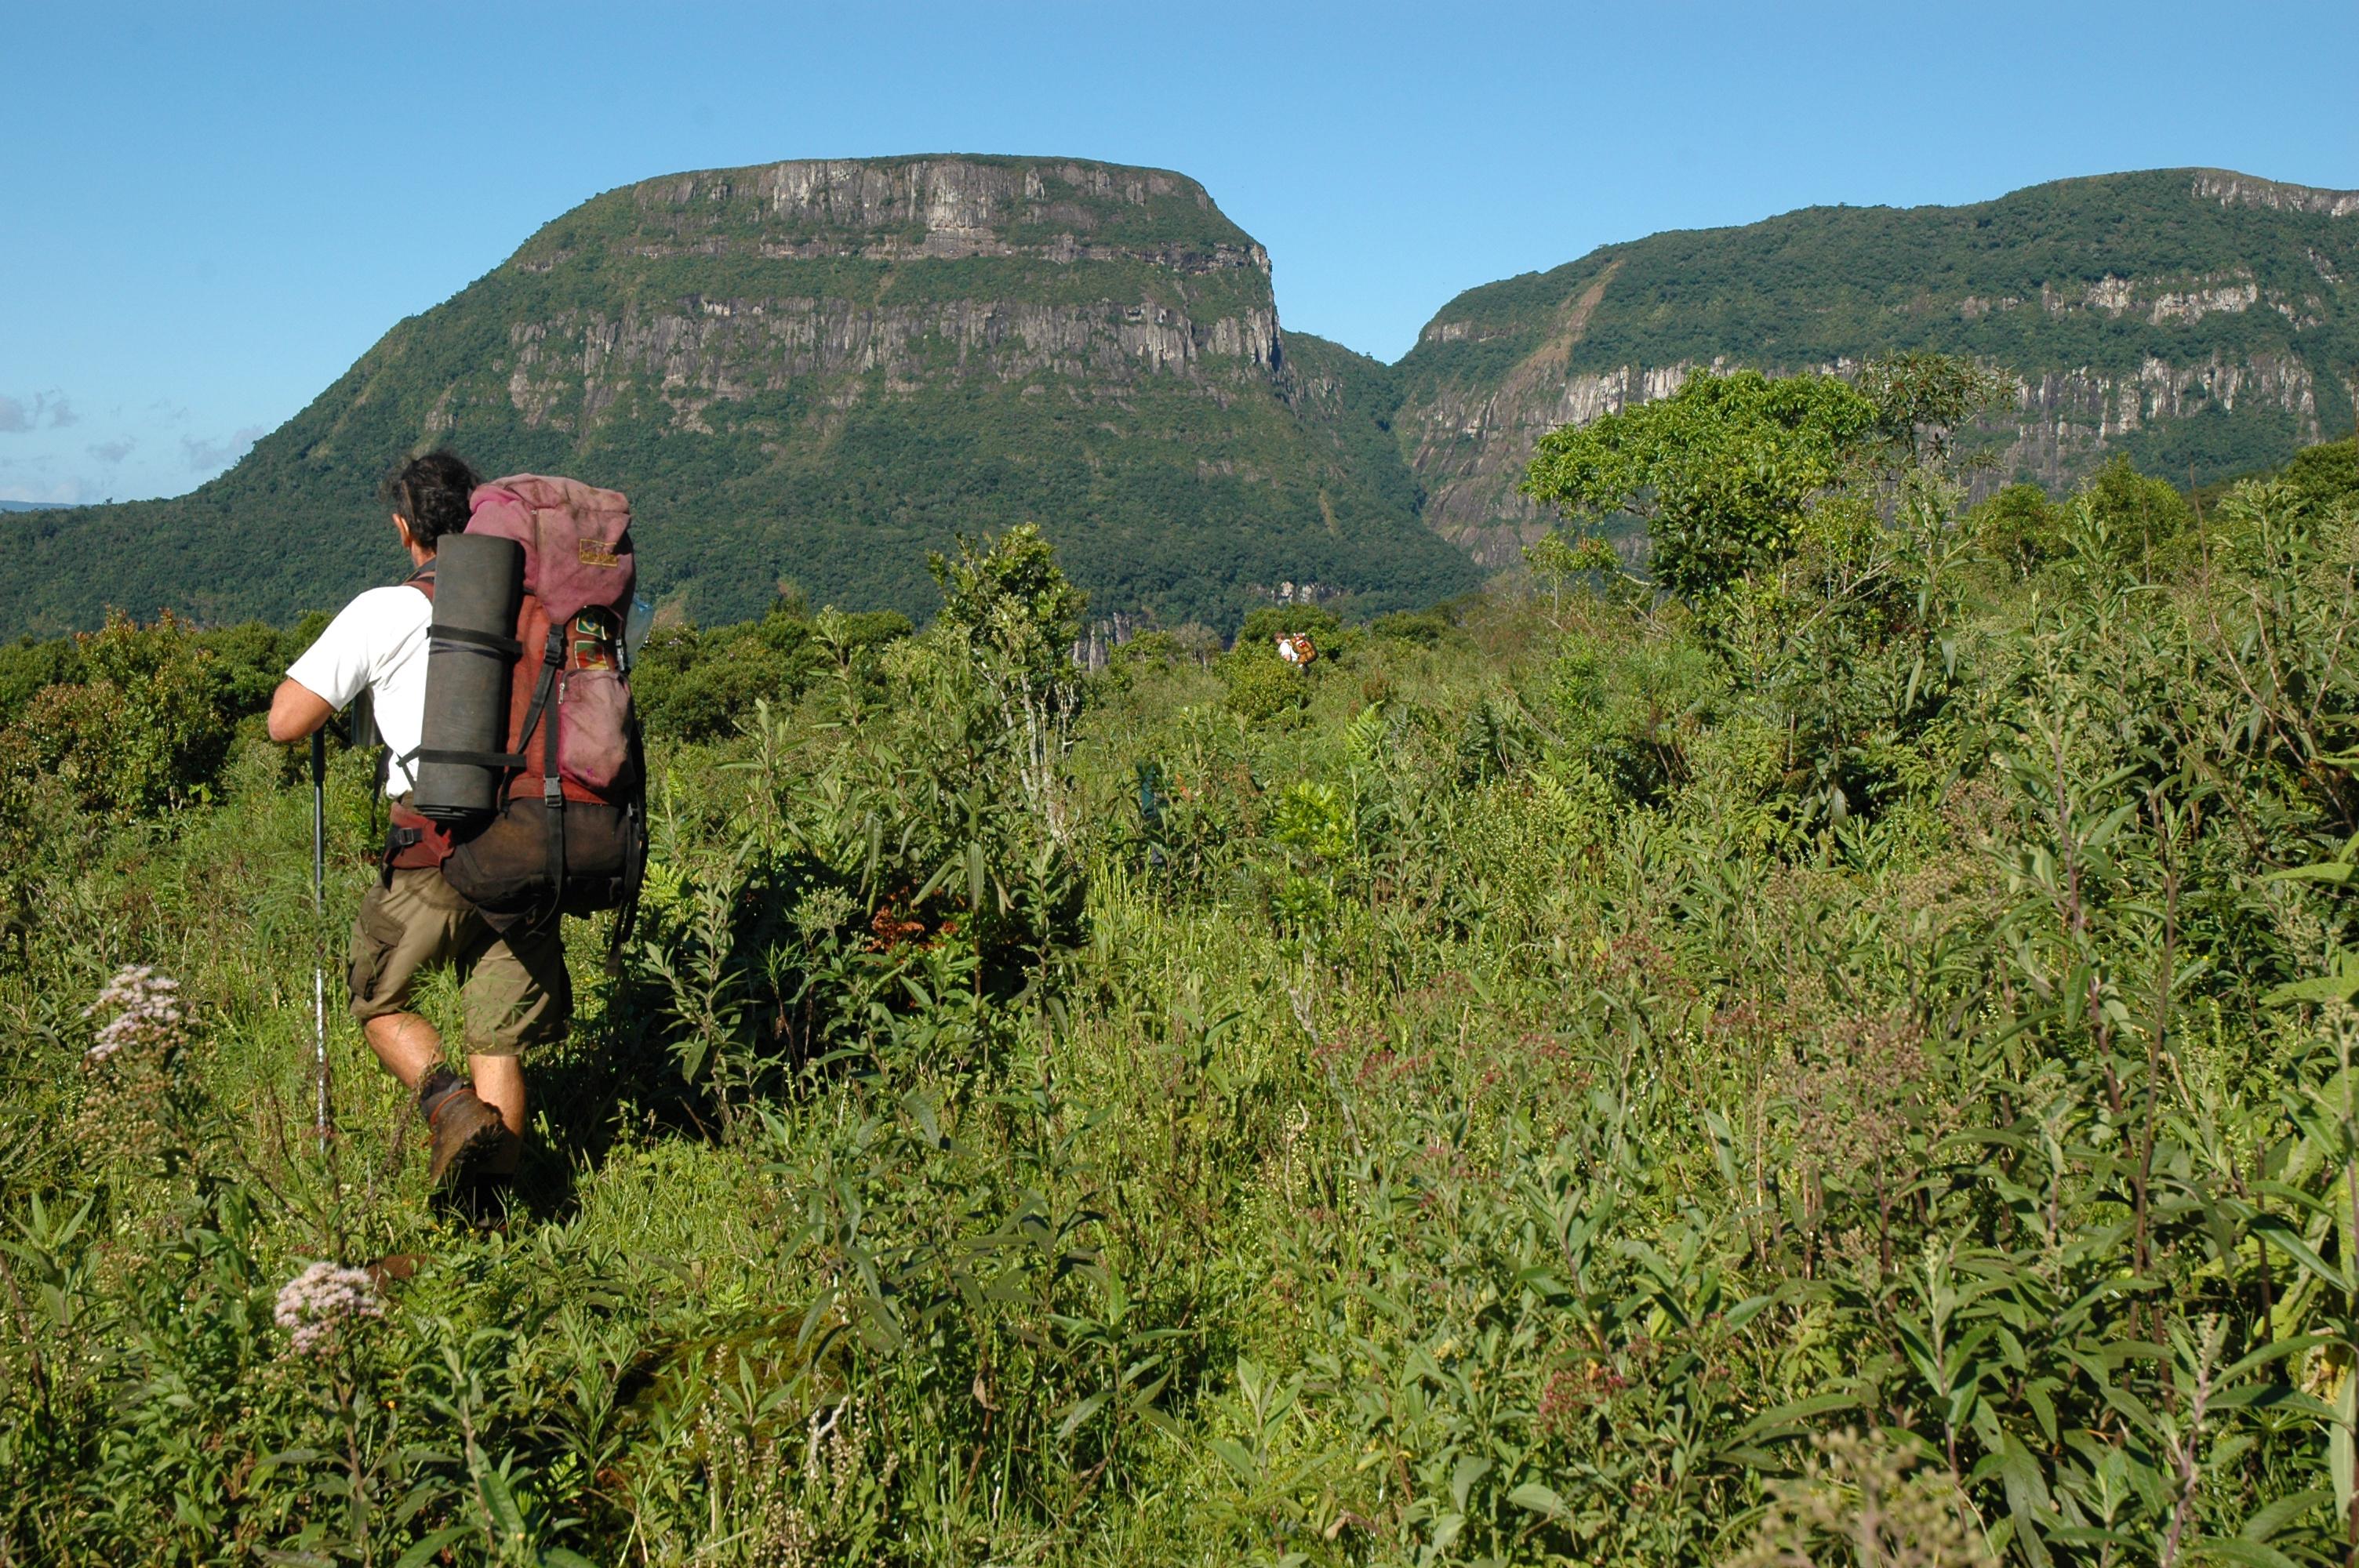 Man trekking in Serra Geral in South Brazil